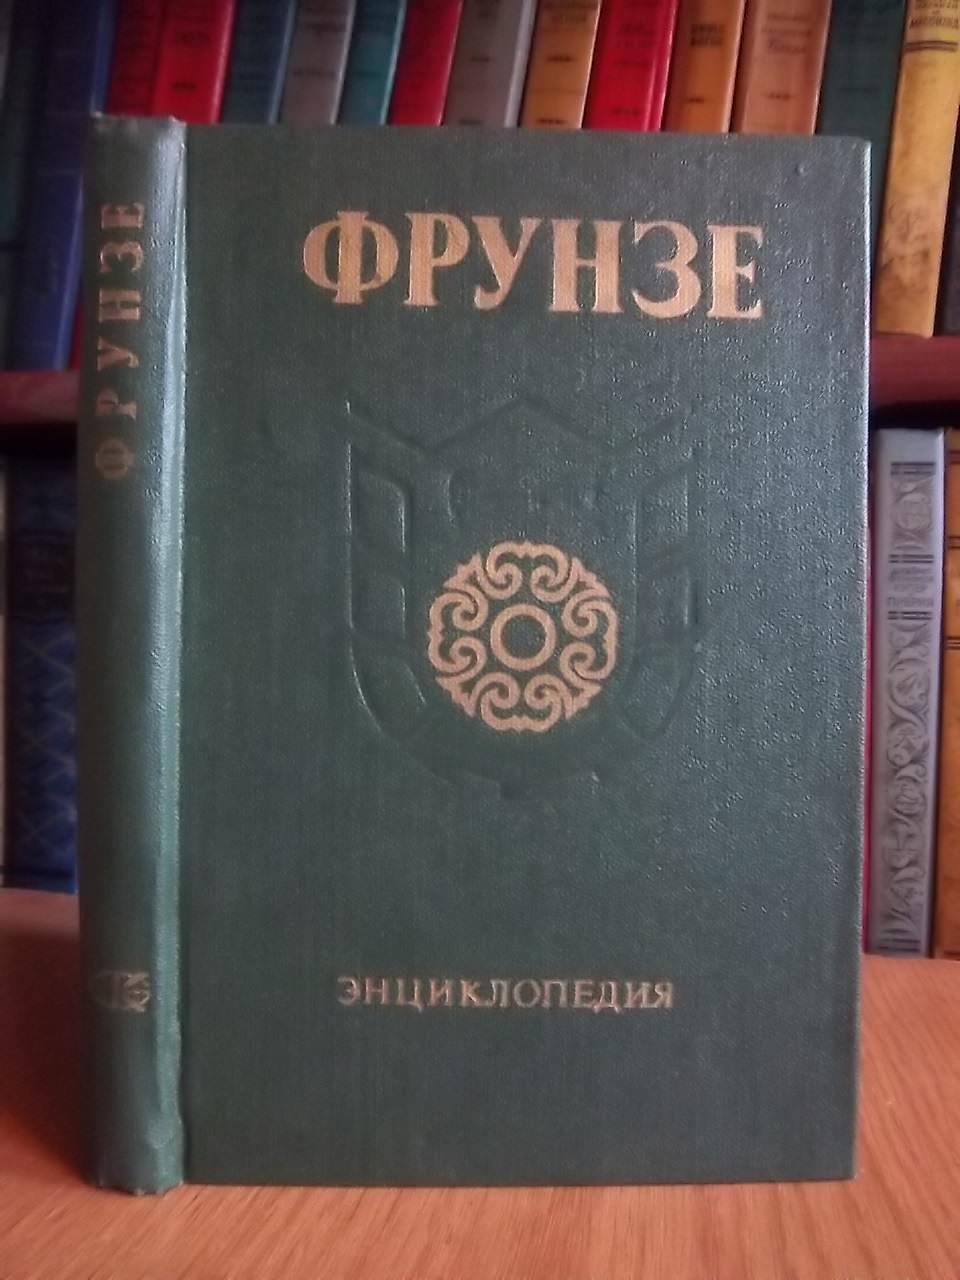 Фрунзе Энциклопедия